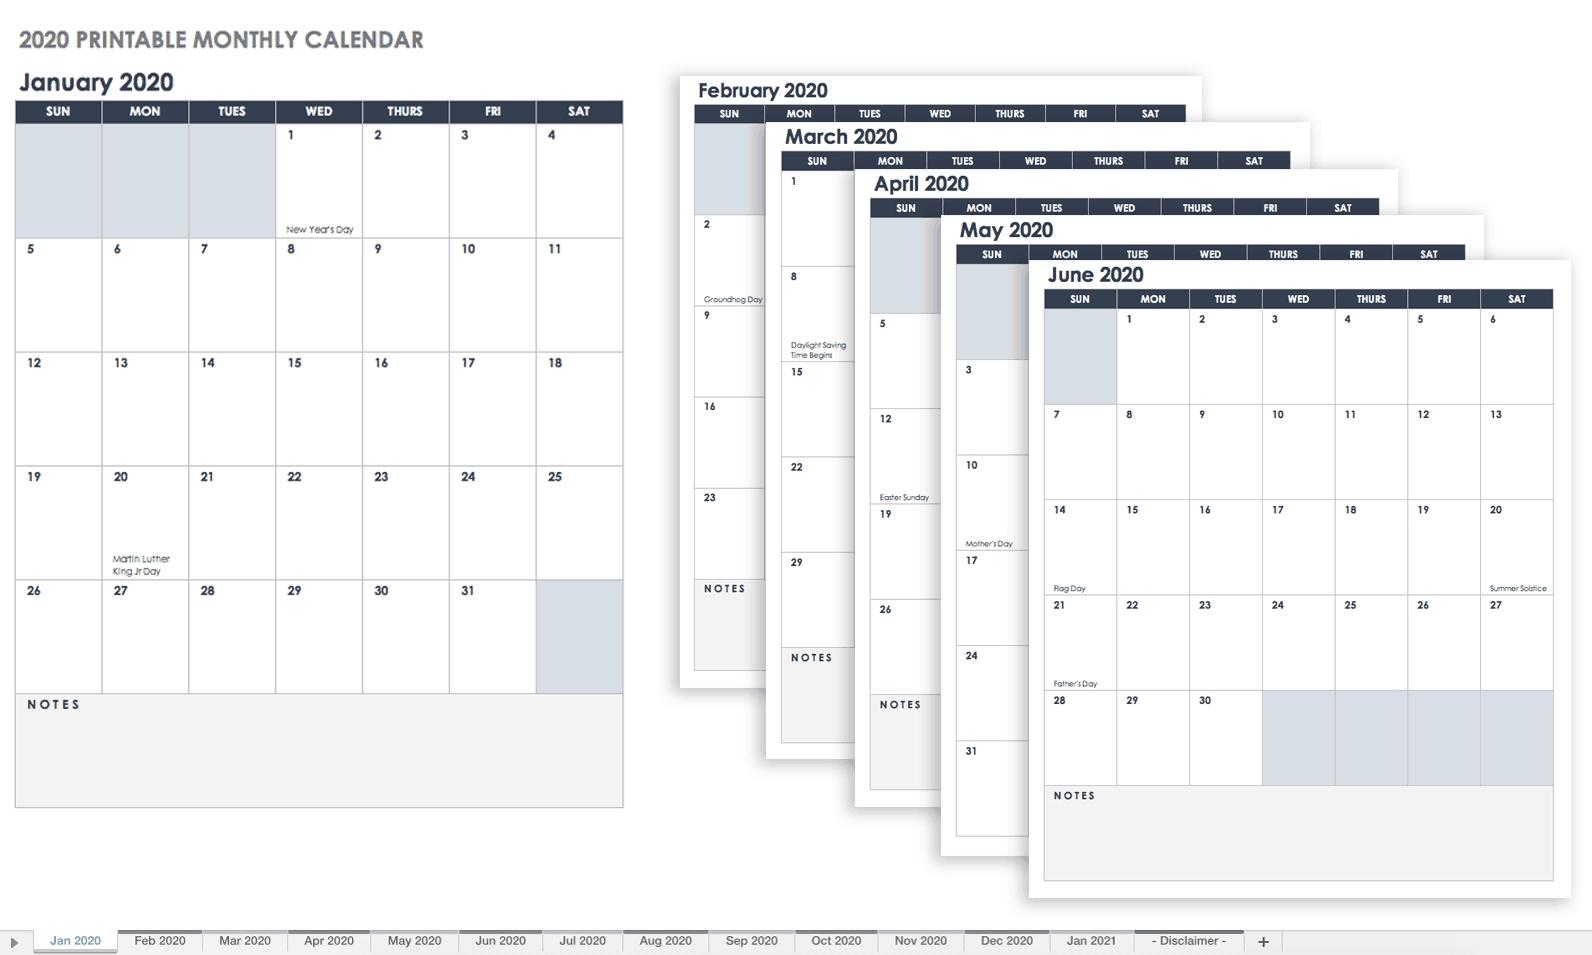 Free Blank Calendar Templates - Smartsheet-Blank Calendar No Dates